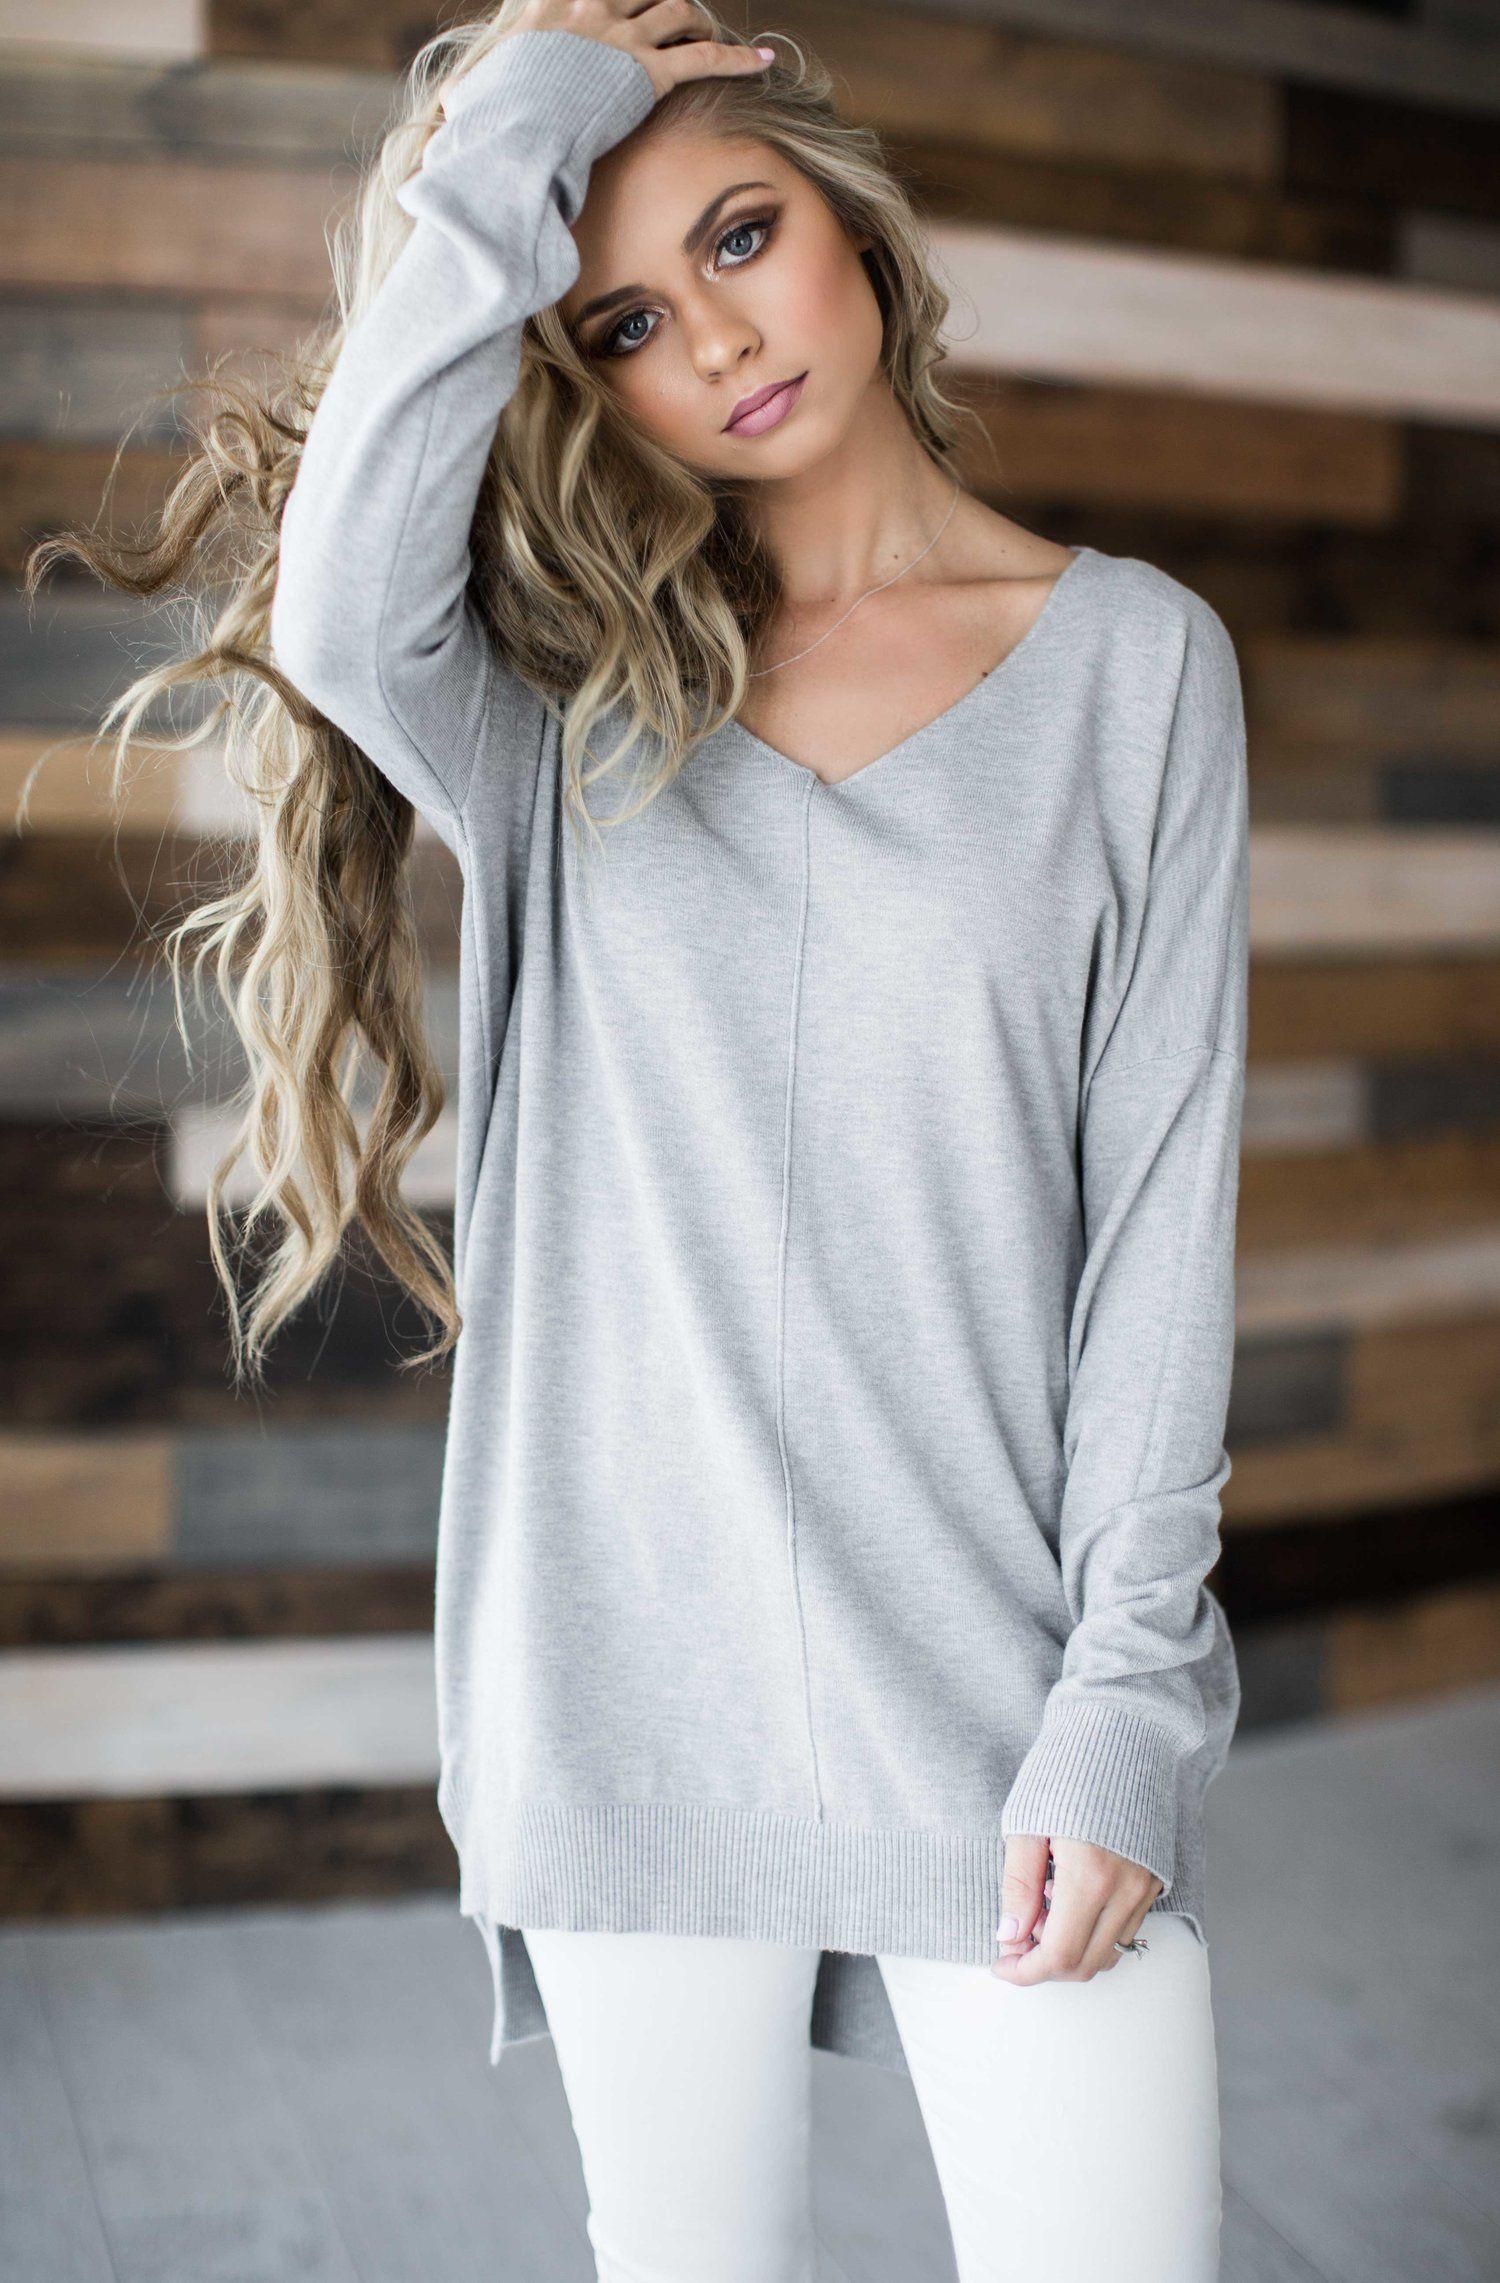 9a2fb0b0f spring sweater, blush, pastel, sweater, spring style, fashion, style, blonde,  hair, shop jessakae, shirts, makeup, grey